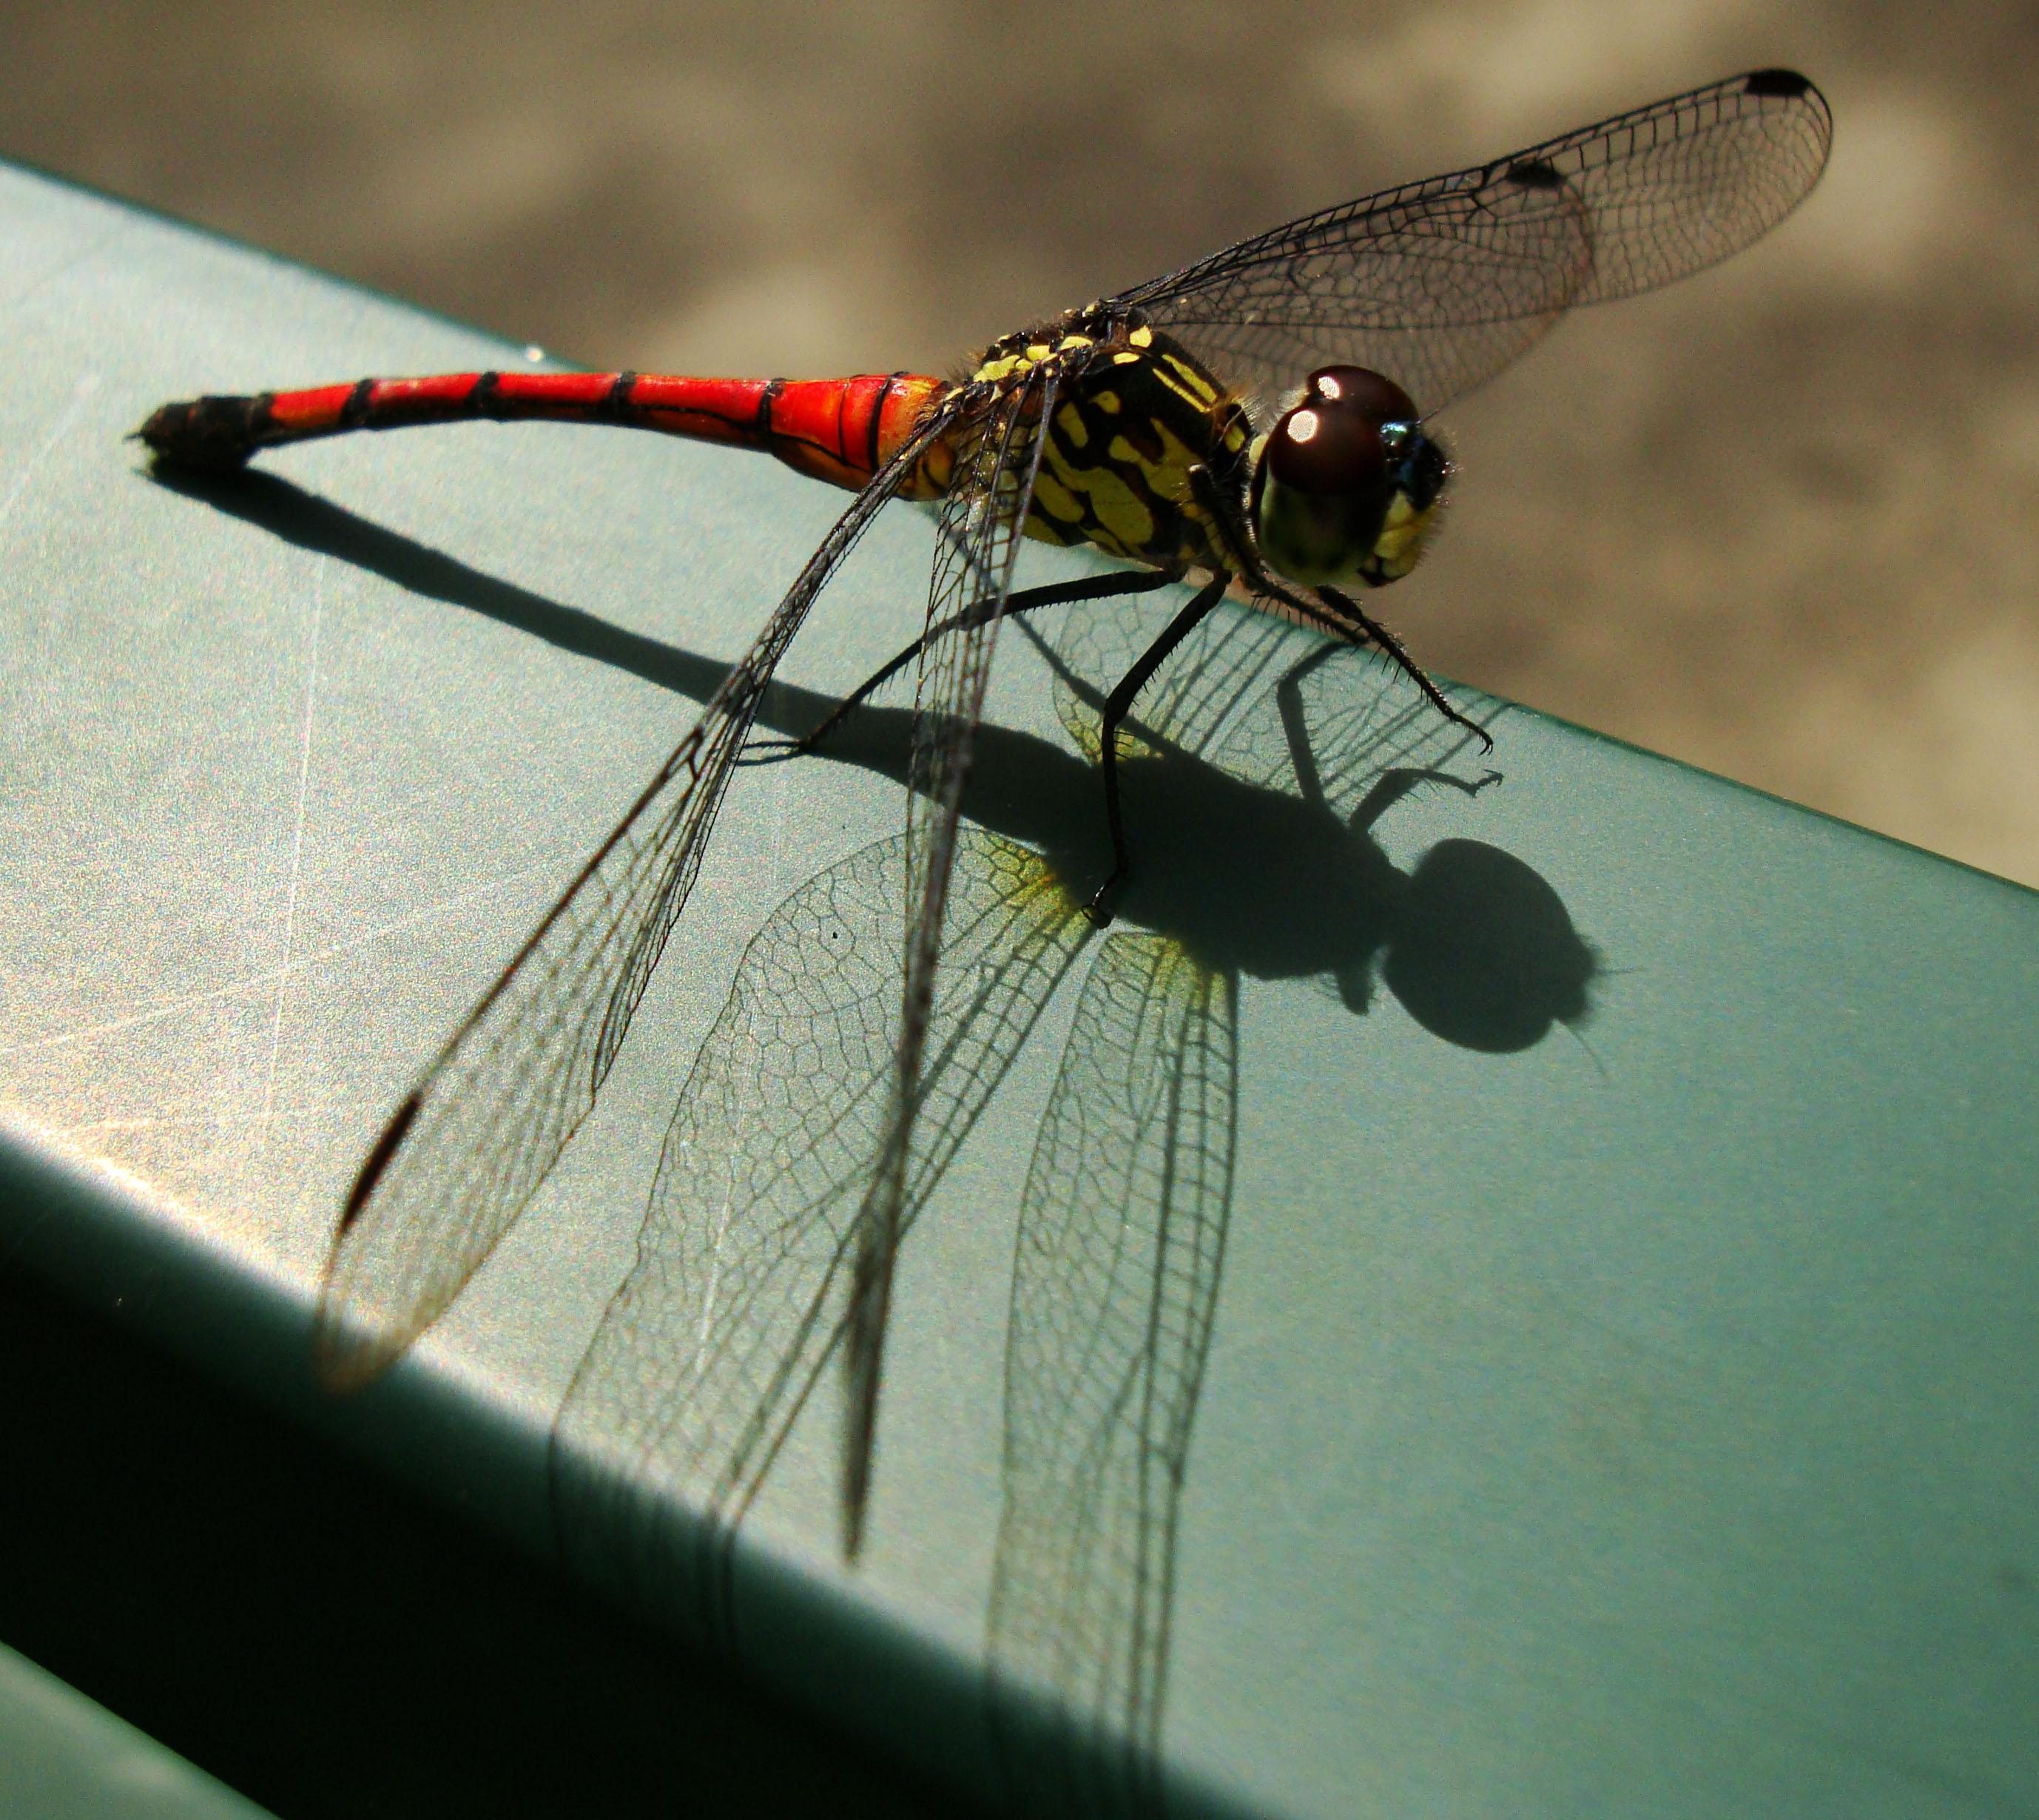 Libellulidae Red Swampdragon Agrionoptera insignis allogenes Sunshine Coast Qld Australia 100